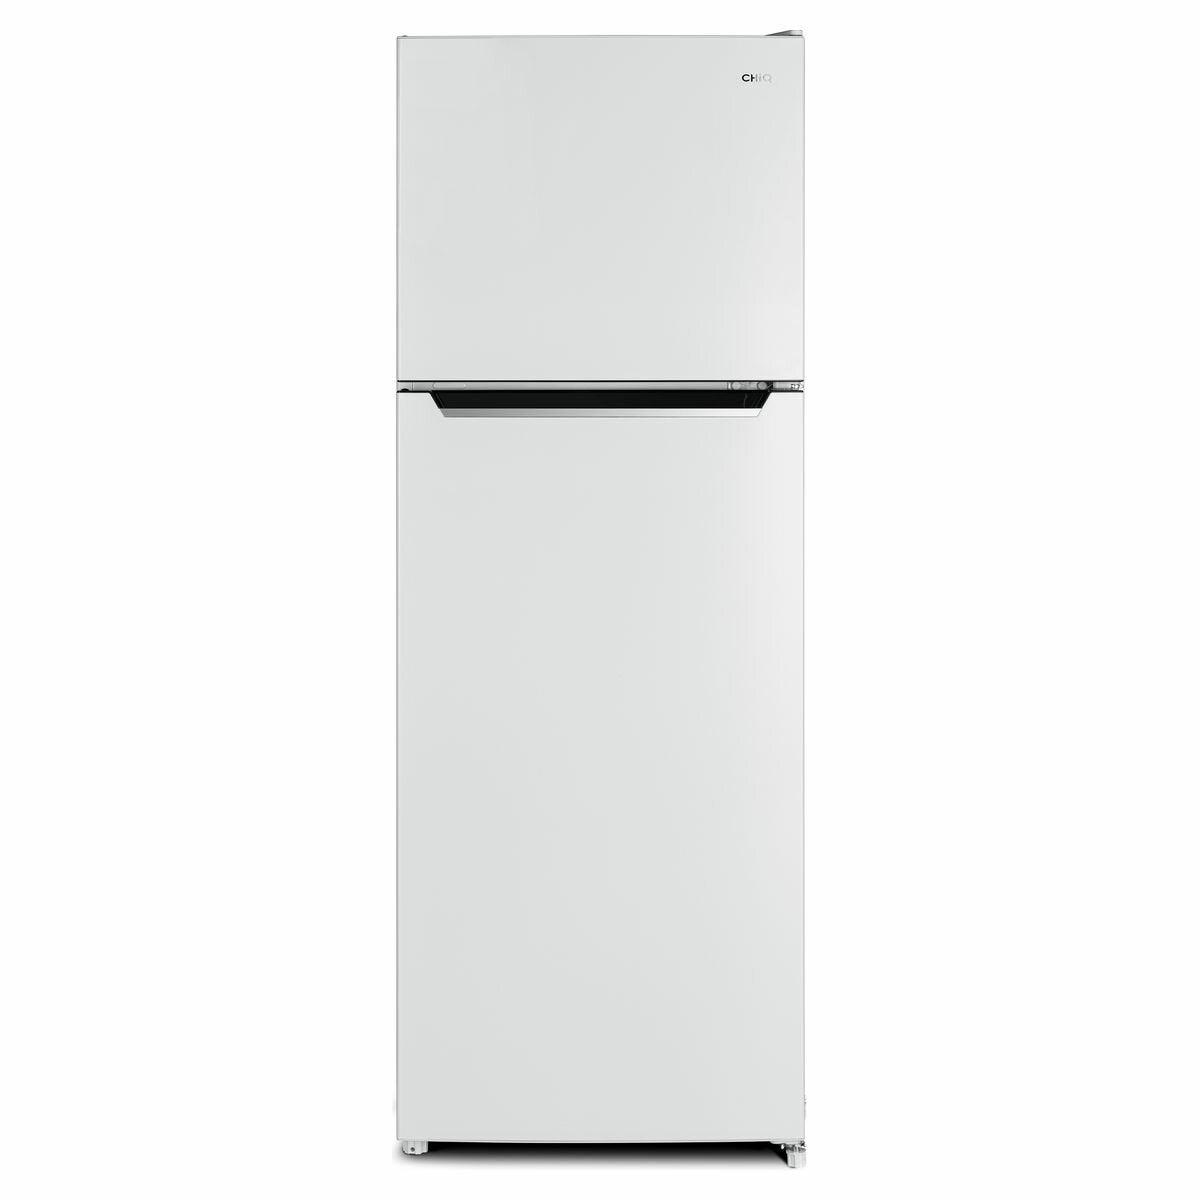 CHiQ CTM348NW Refrigerator